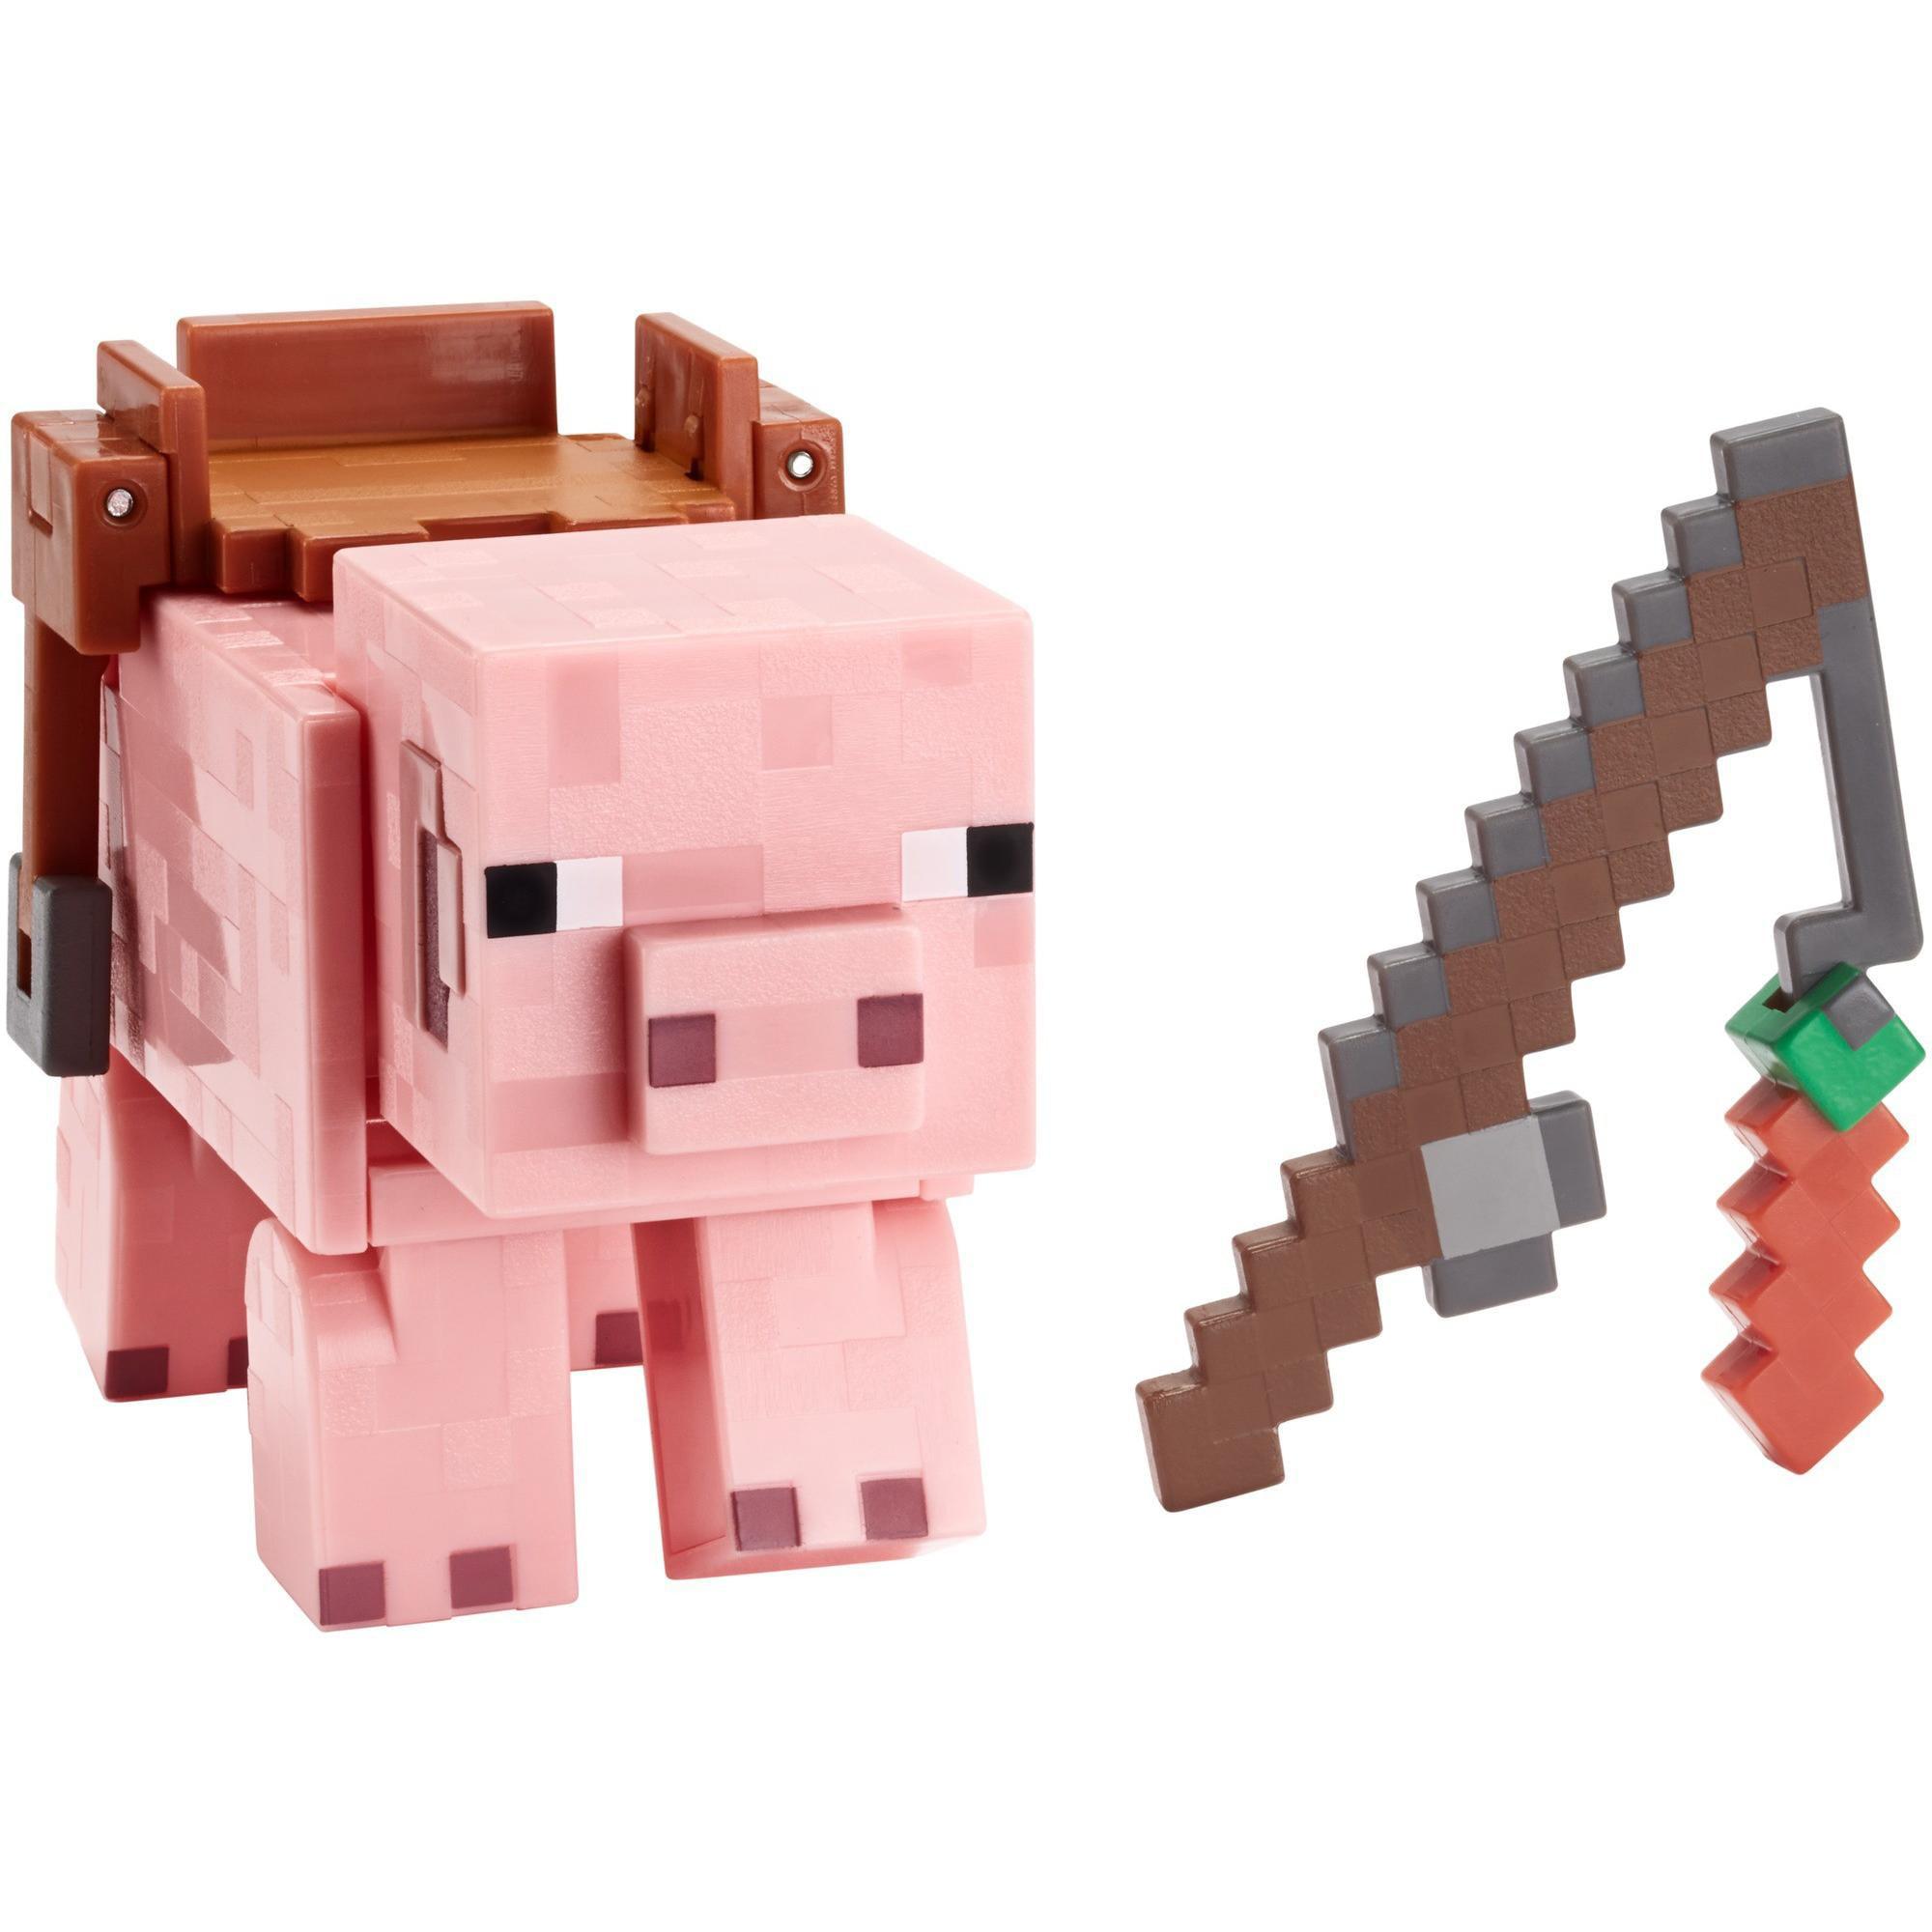 Minecraft Survival Mode 5 Inch Figure - Walmart.com